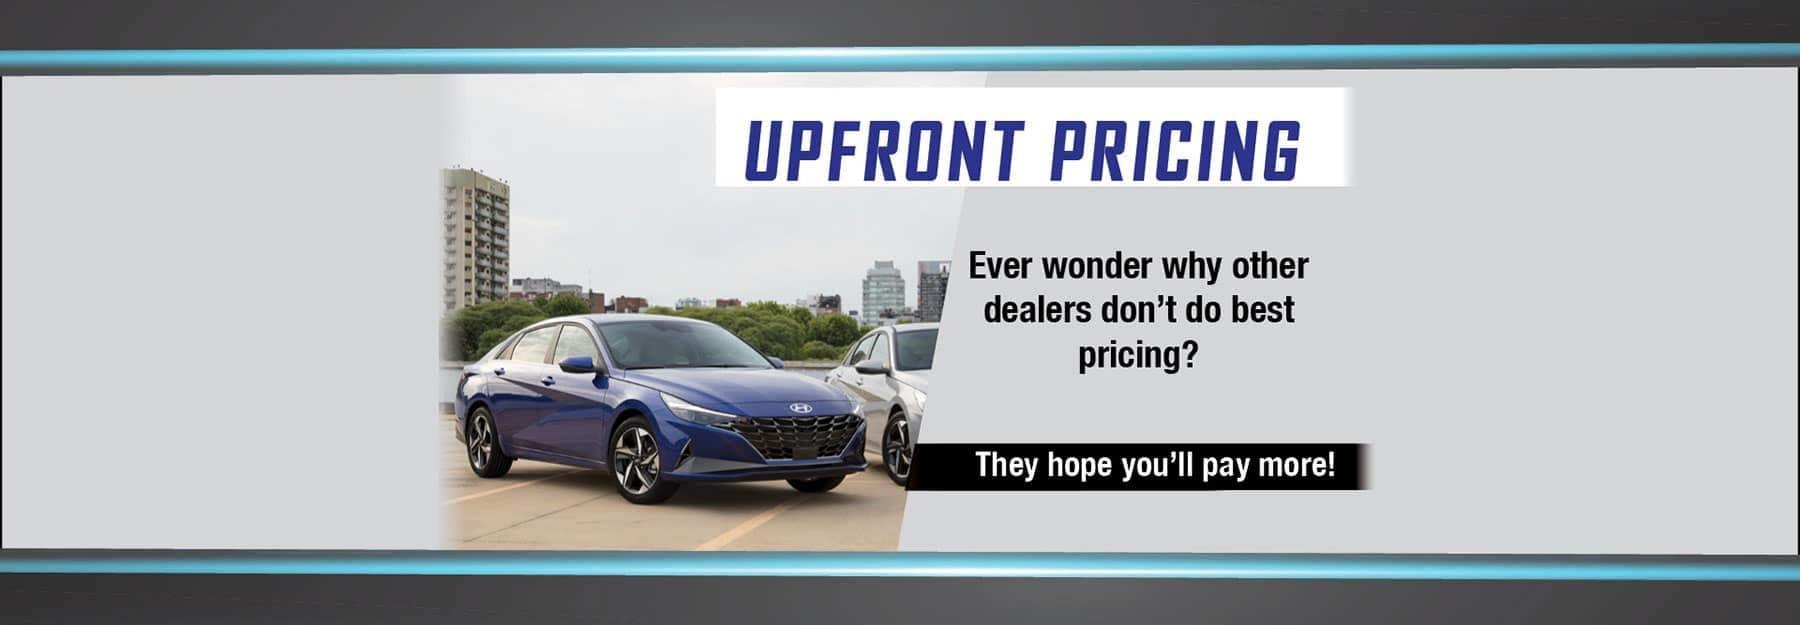 desktop-hyundai-upfront-pricing